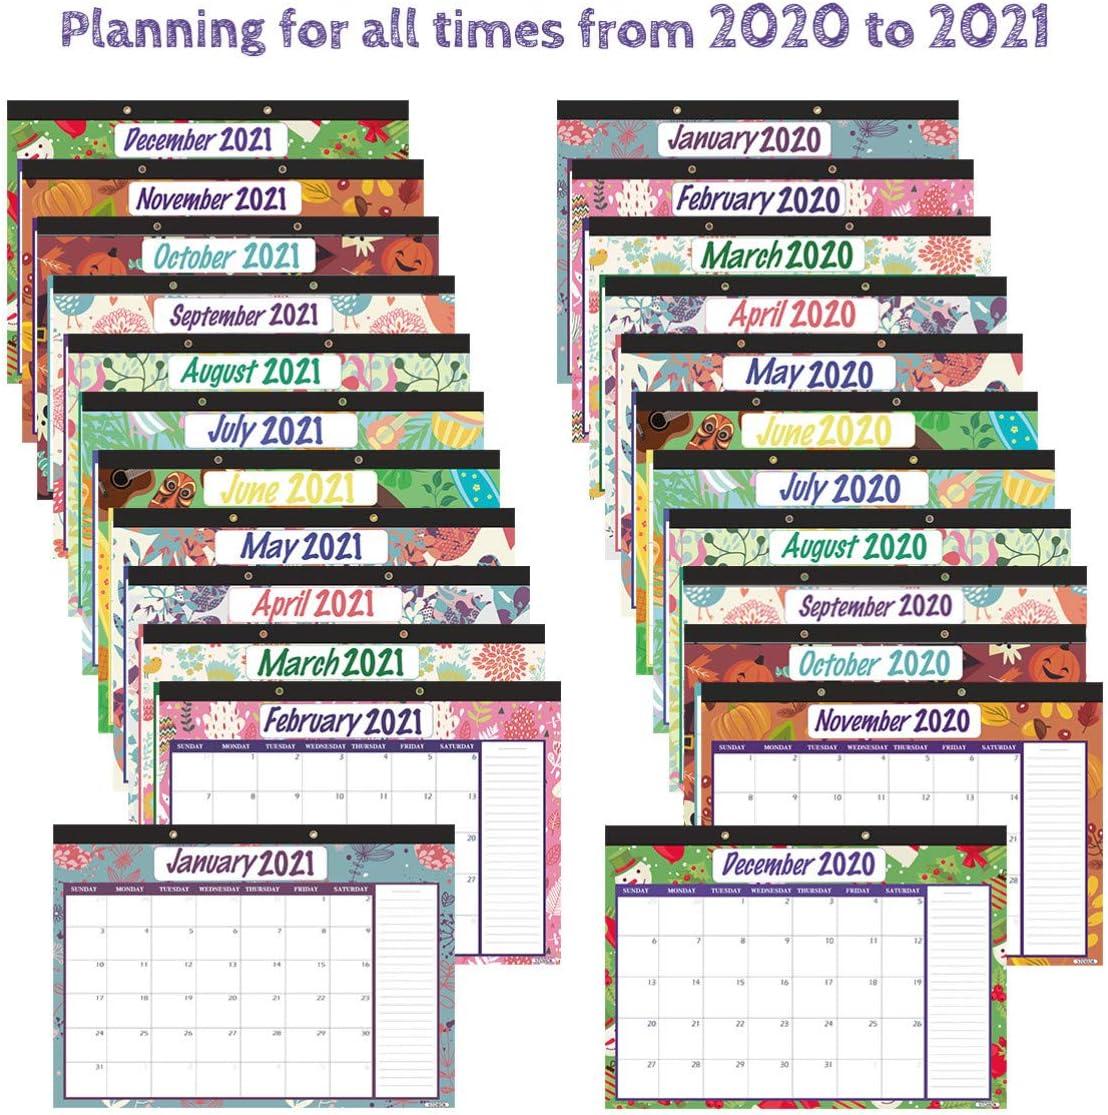 STOBOK Calendario da Tavolo 2021 Calendario da Tavolo 2021 da Tavolo Calendario da Tavolo per Lanno Accademico per Scuola Ufficio Casa